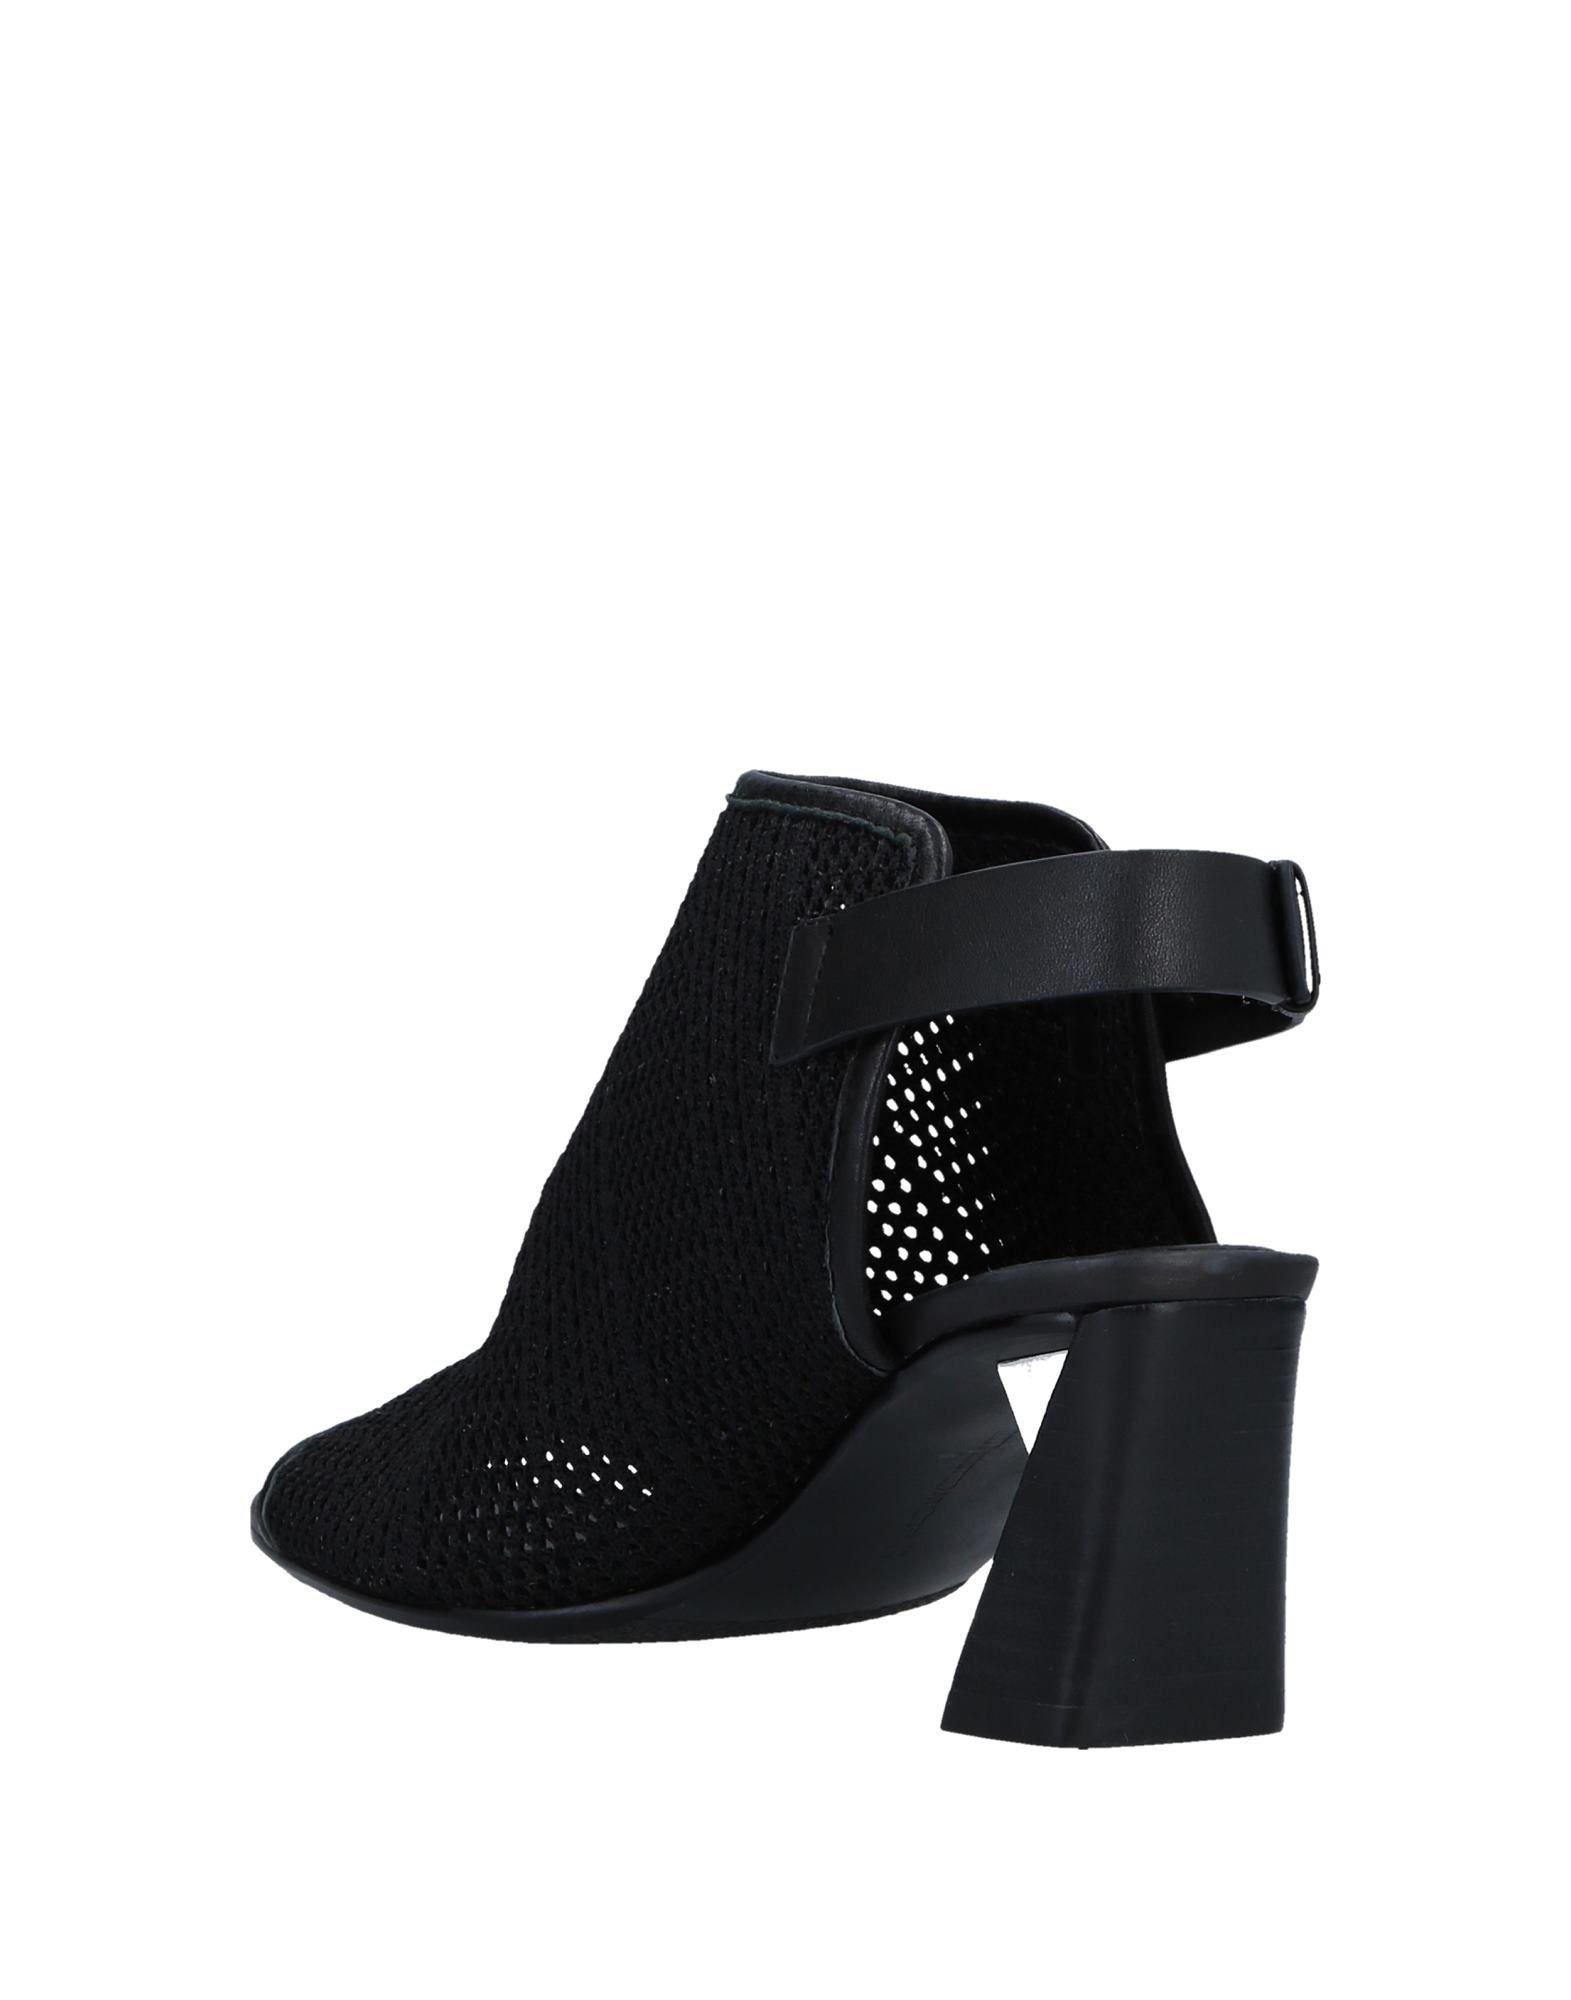 Gut um billige 11534284QG Schuhe zu tragenUnited Nude Sandalen Damen 11534284QG billige 84b0c3